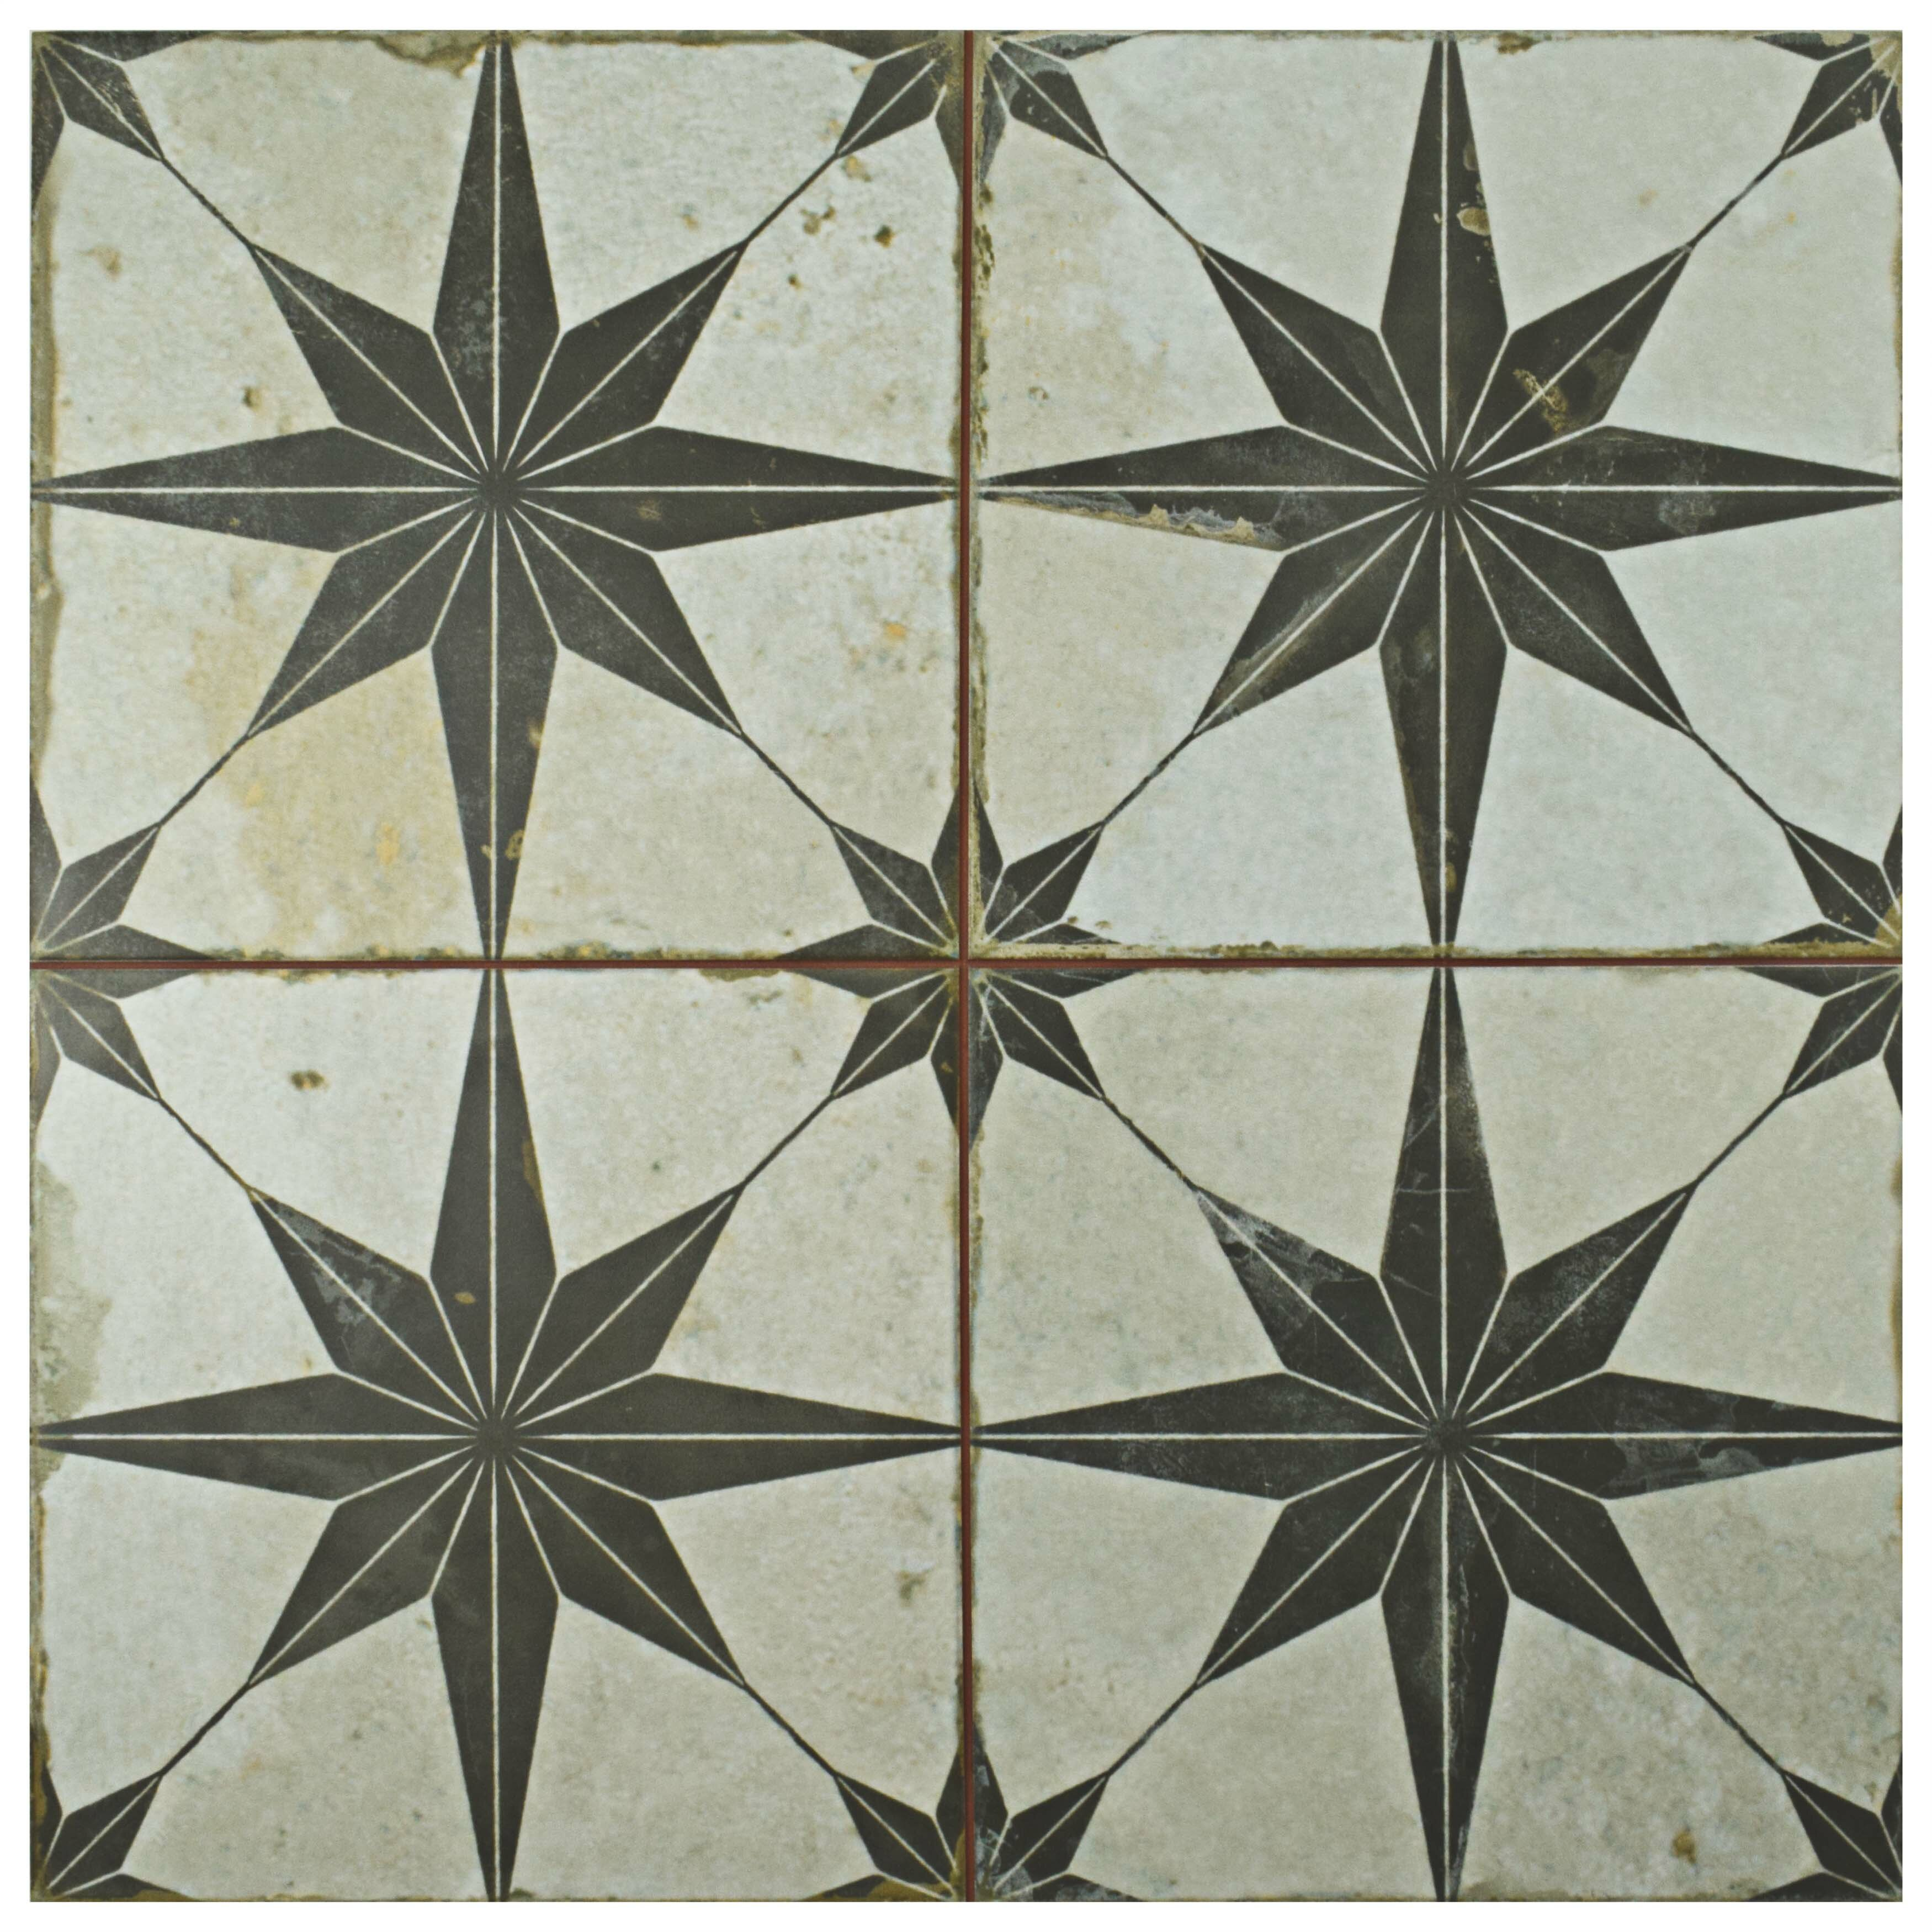 Elitetile allmodern royalty 1763 x 1763 ceramic field tile in beigegray dailygadgetfo Choice Image